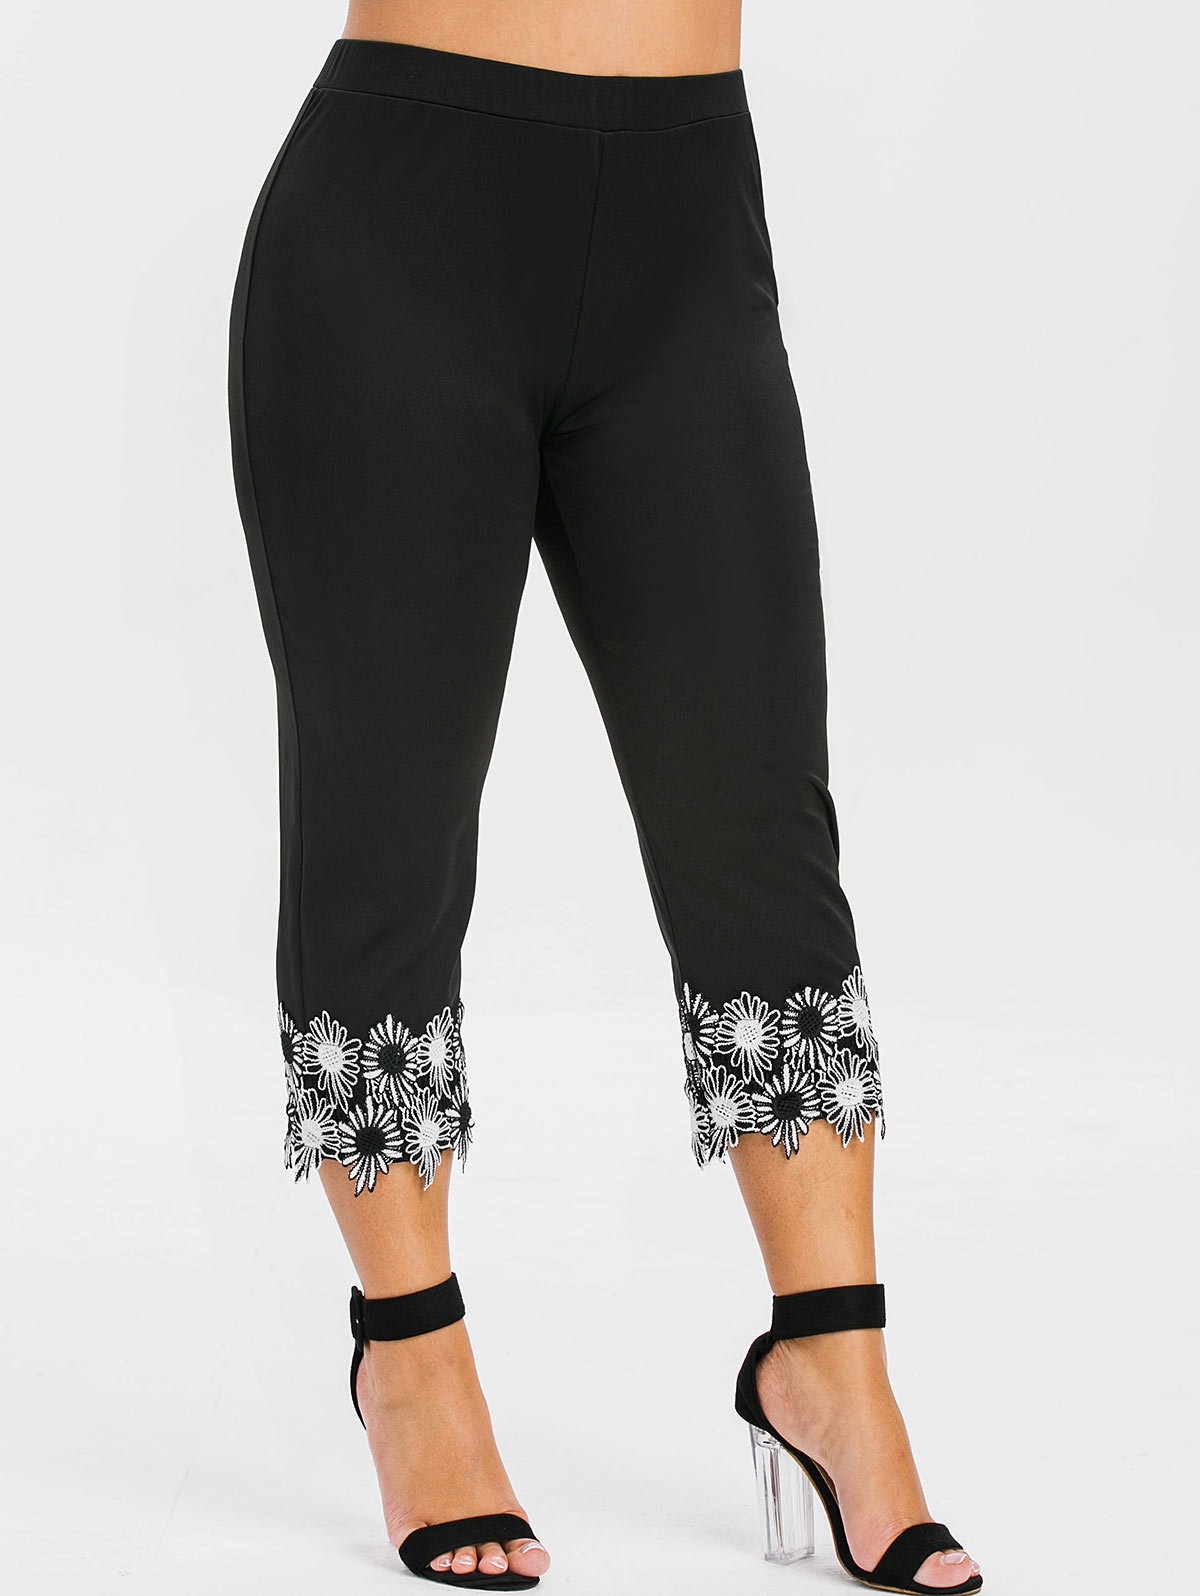 Rosegal Plus Size Lace Applique Capri   Leggings   High Waist Straight Capri Gym   Leggings   Fitness Women Summer Casual Bottoms 2019